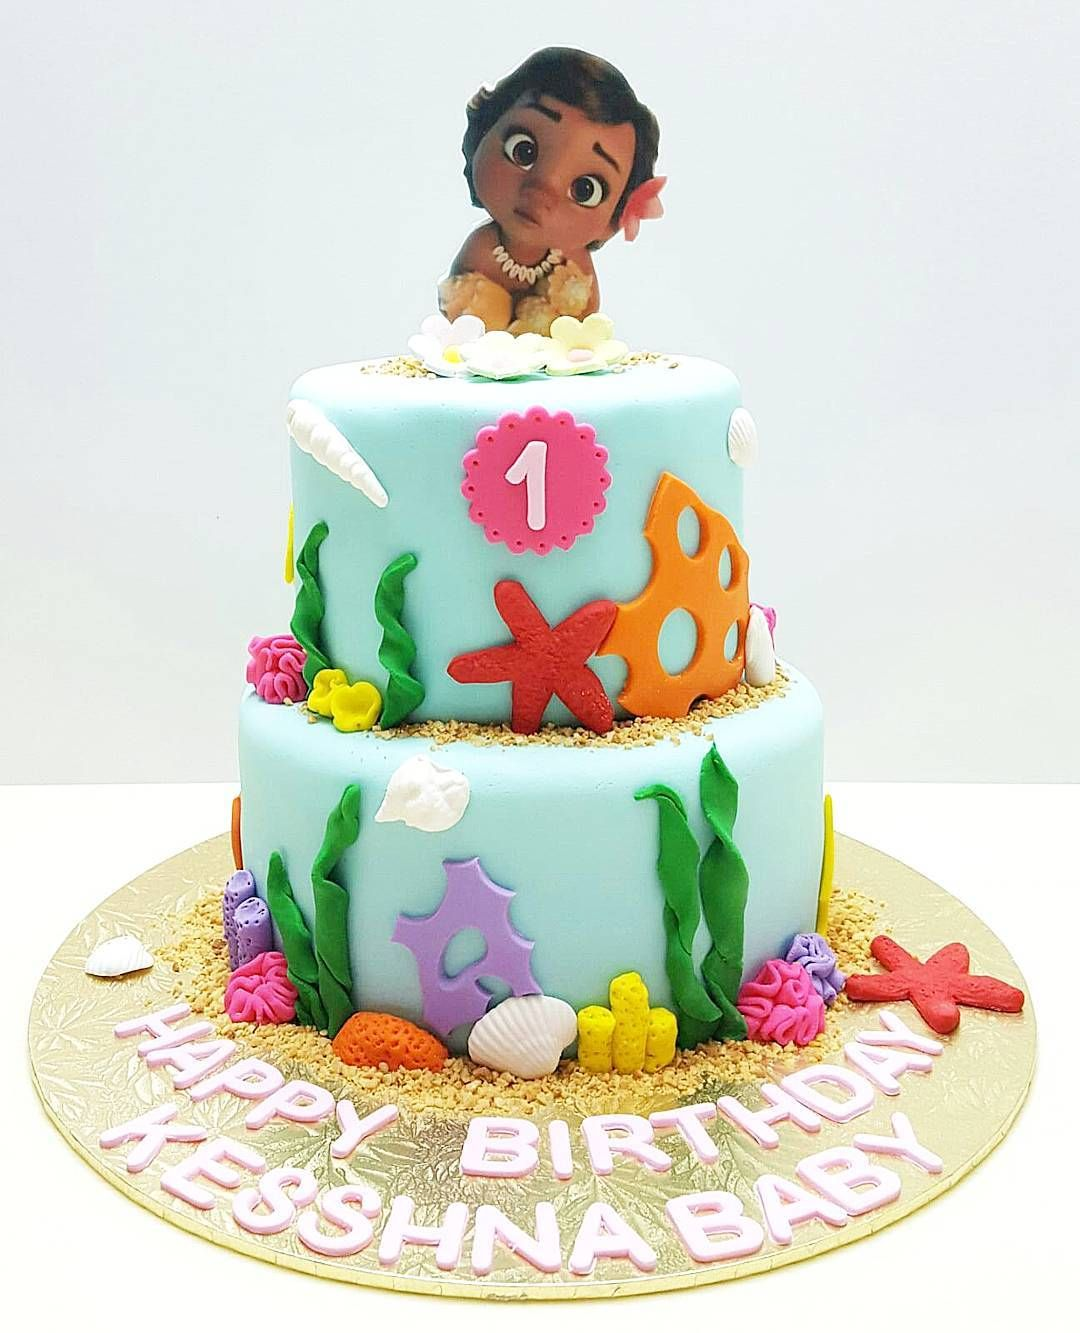 Resultado de imagen para moana cake | Cumple 2 | Pinterest ...